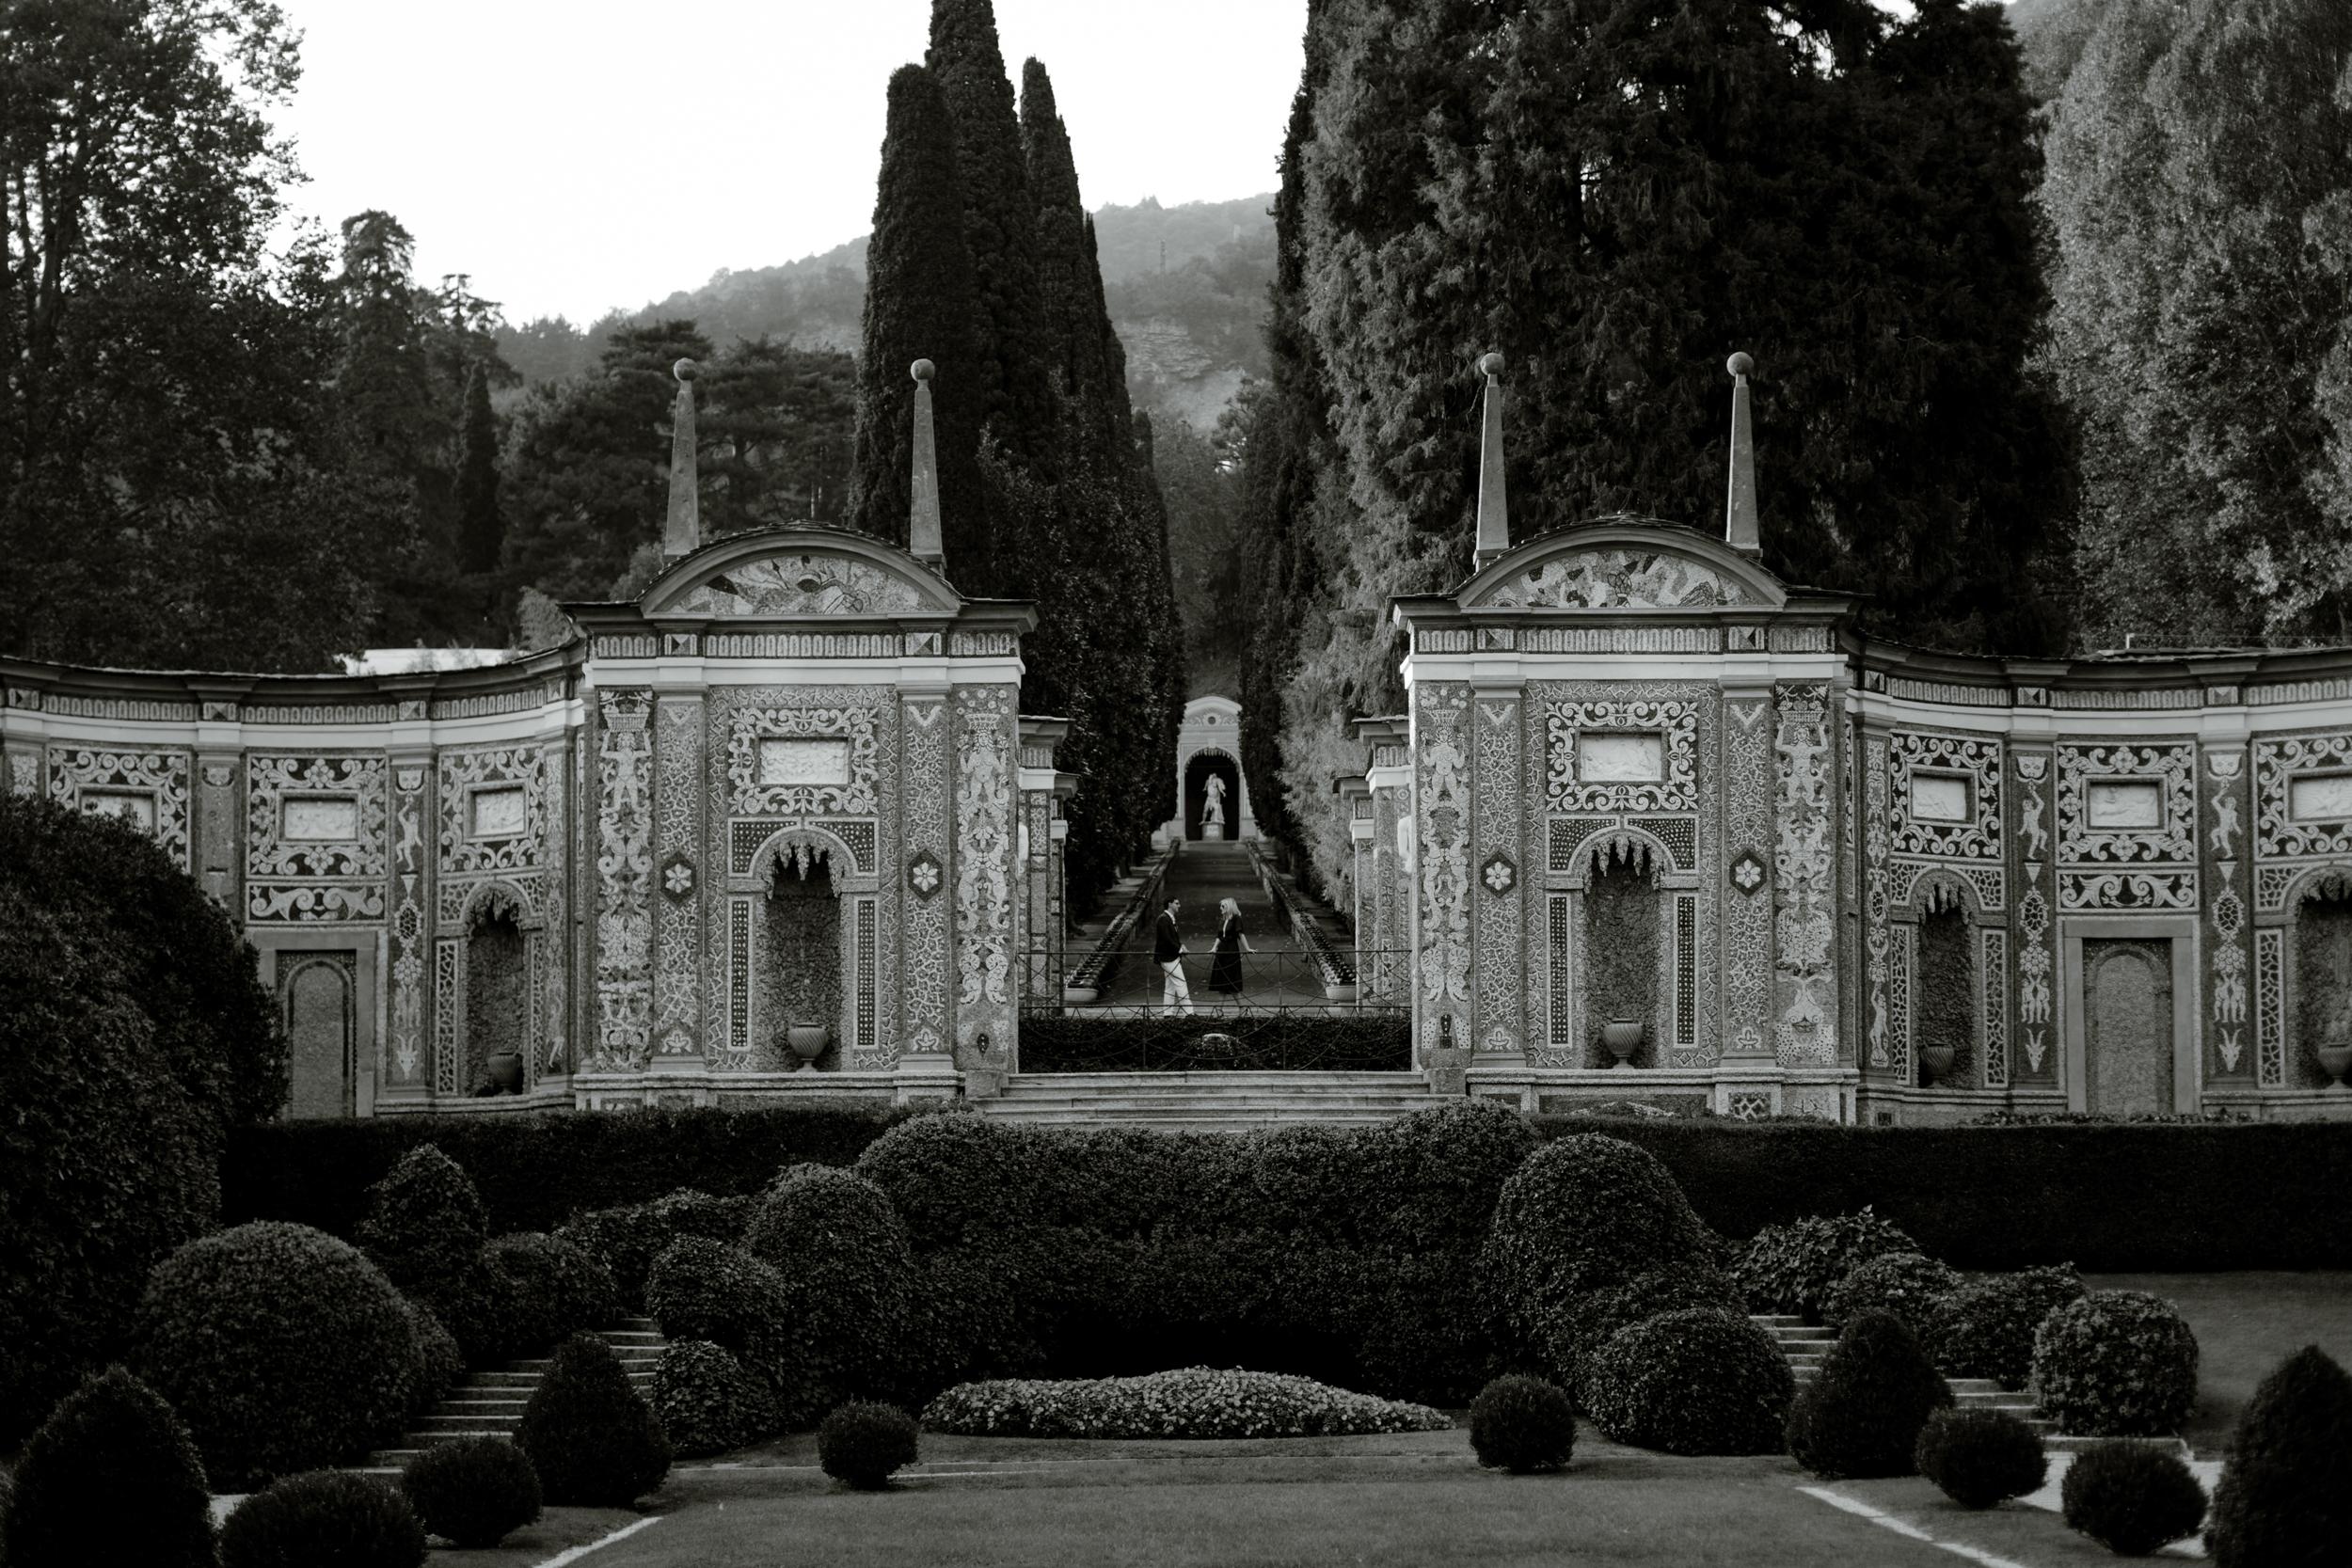 engagement-villa-este-cernobbio.jpg